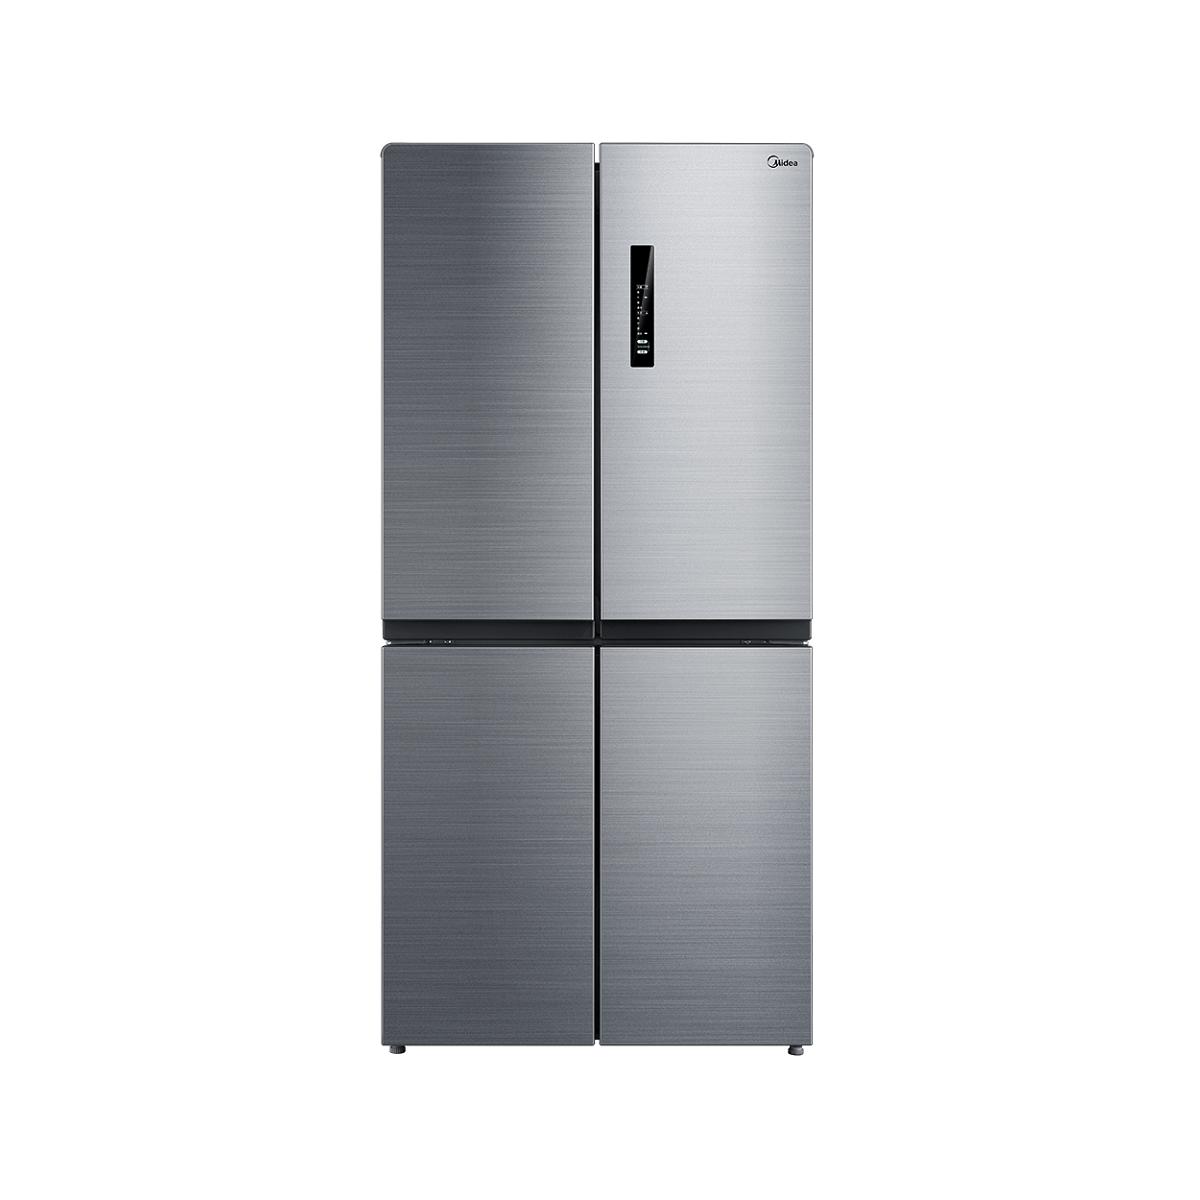 Midea/美的 BCD-450WTPM(E)冰箱 说明书.pdf